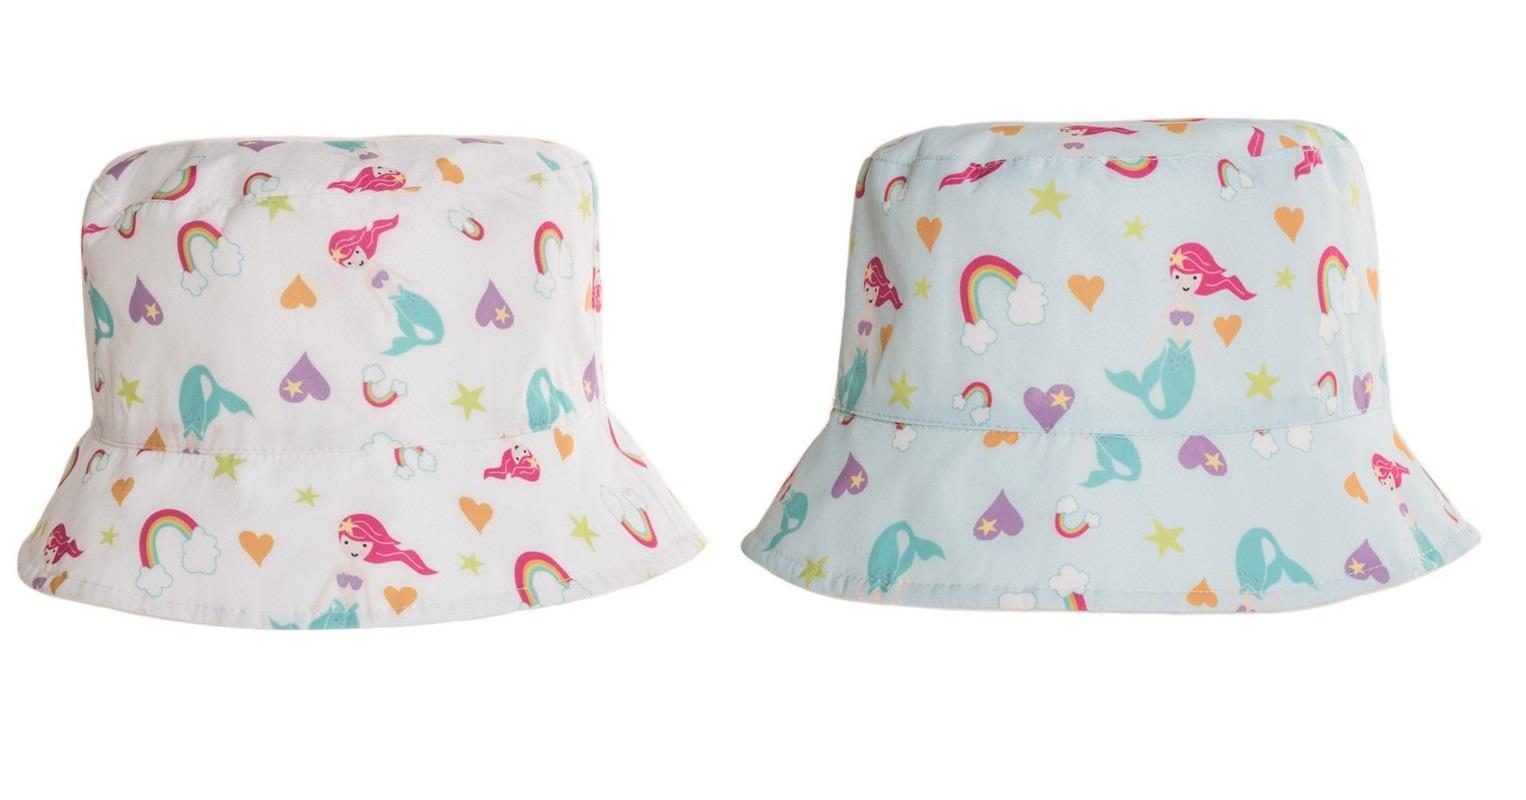 Girls Mermaid Bucket Hat Summer Sun Protection Beach